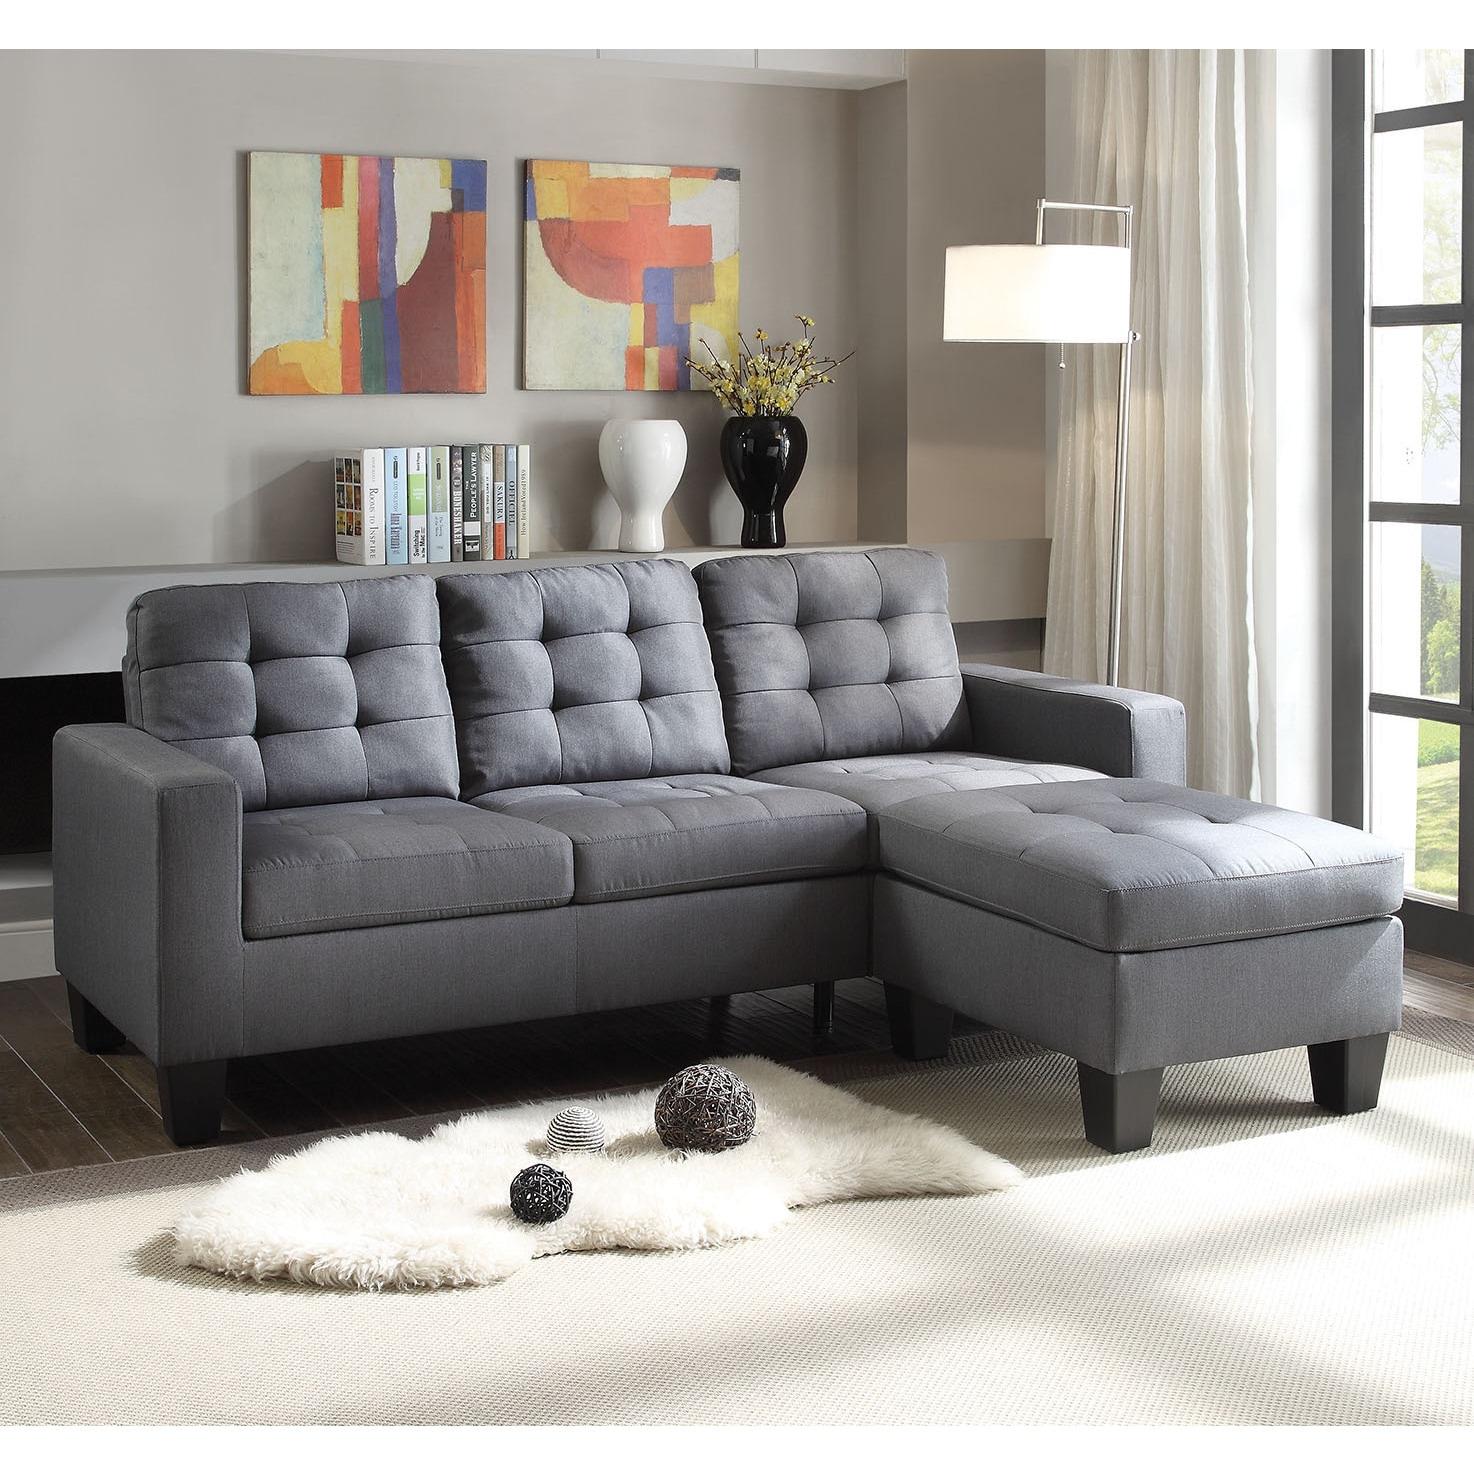 Grey Linen Sectional Sofa